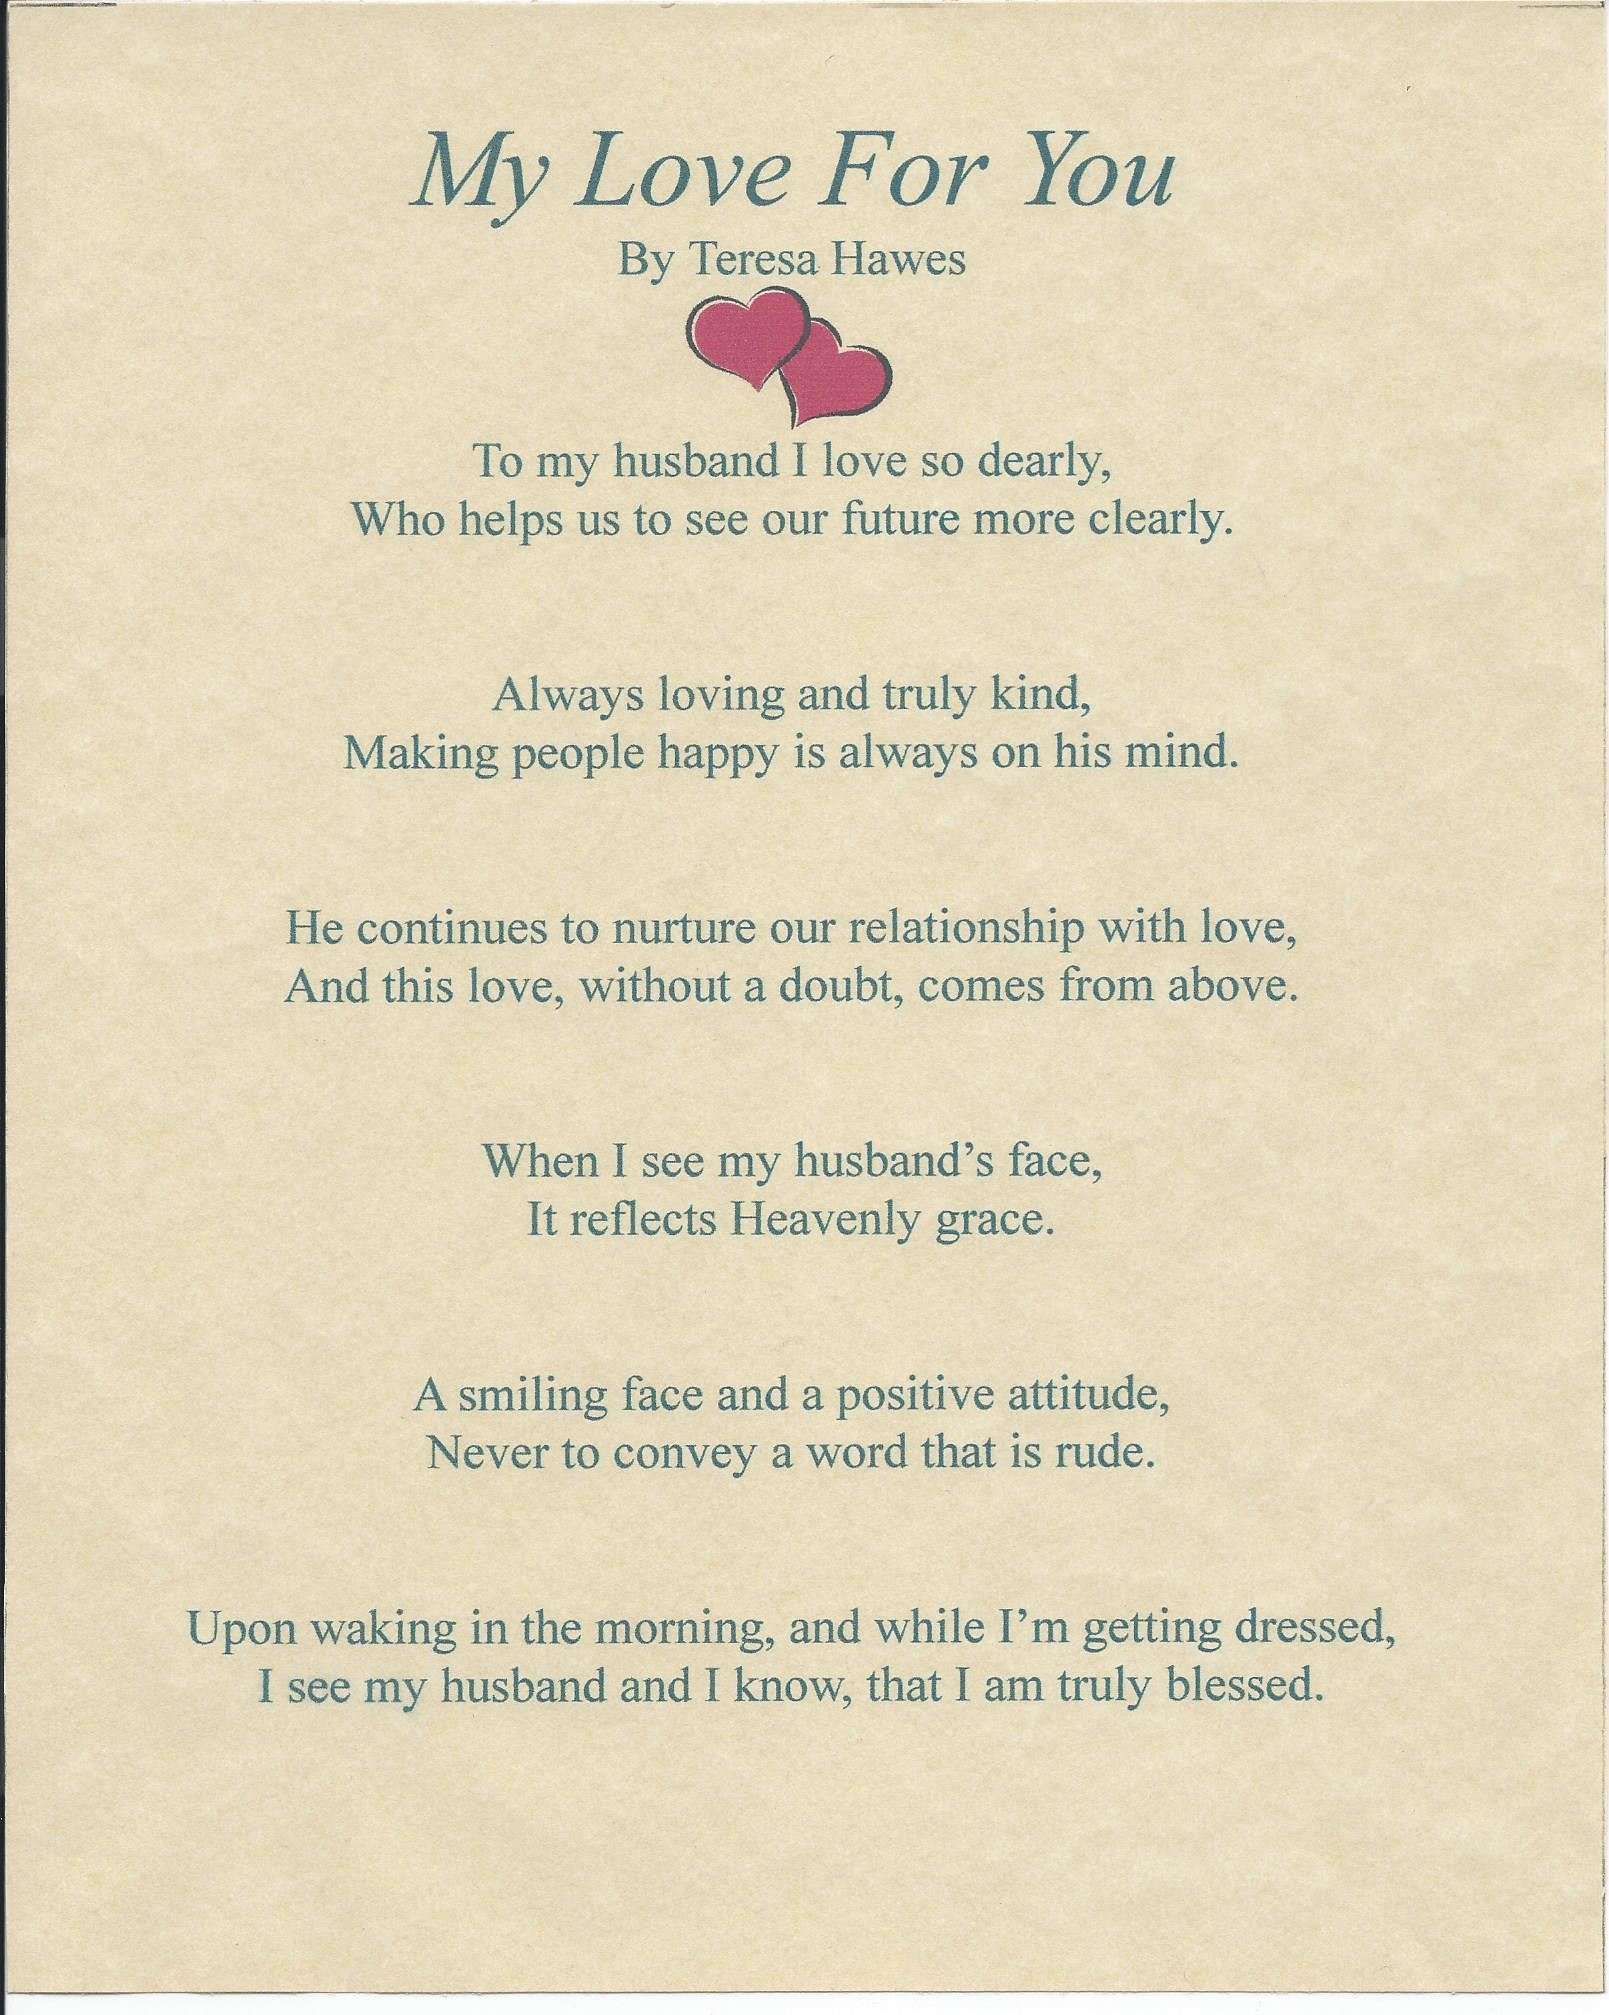 Poems motivational love 13 Short